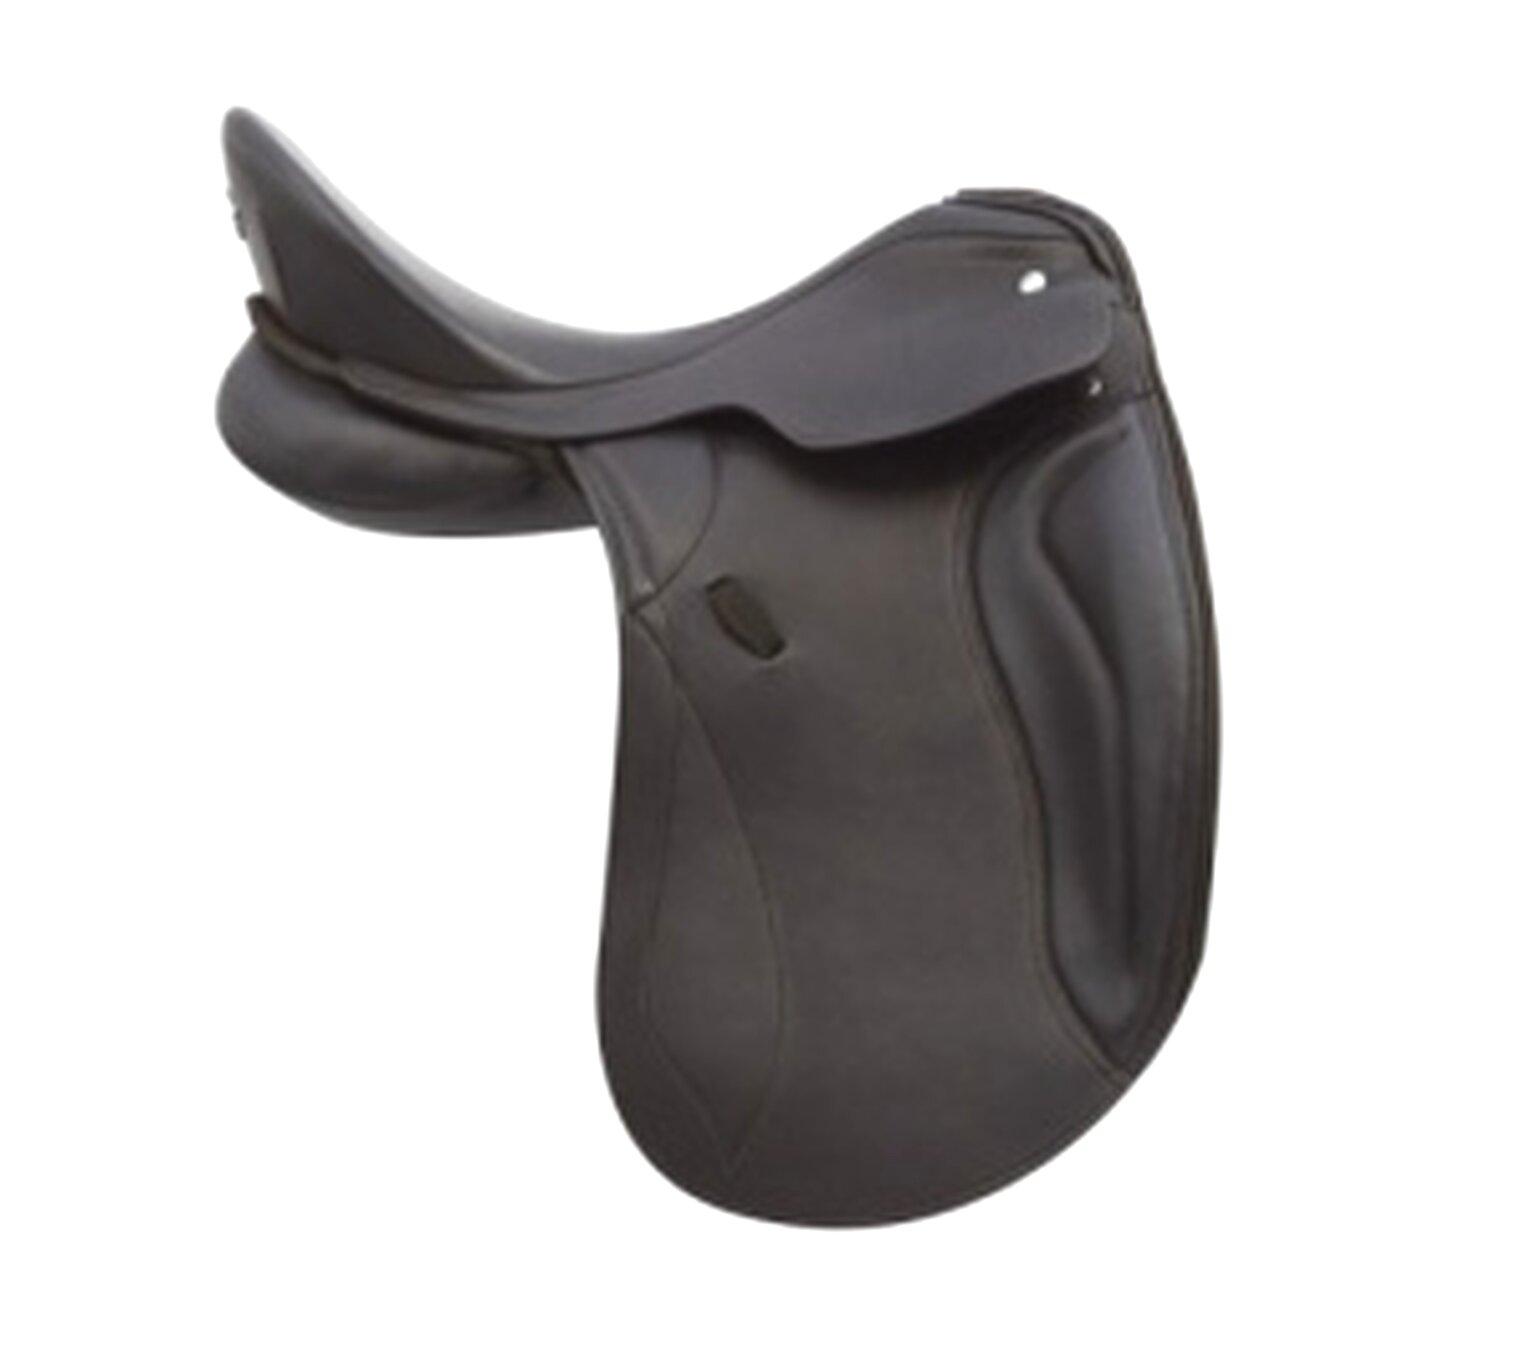 kieffer dressage saddle for sale